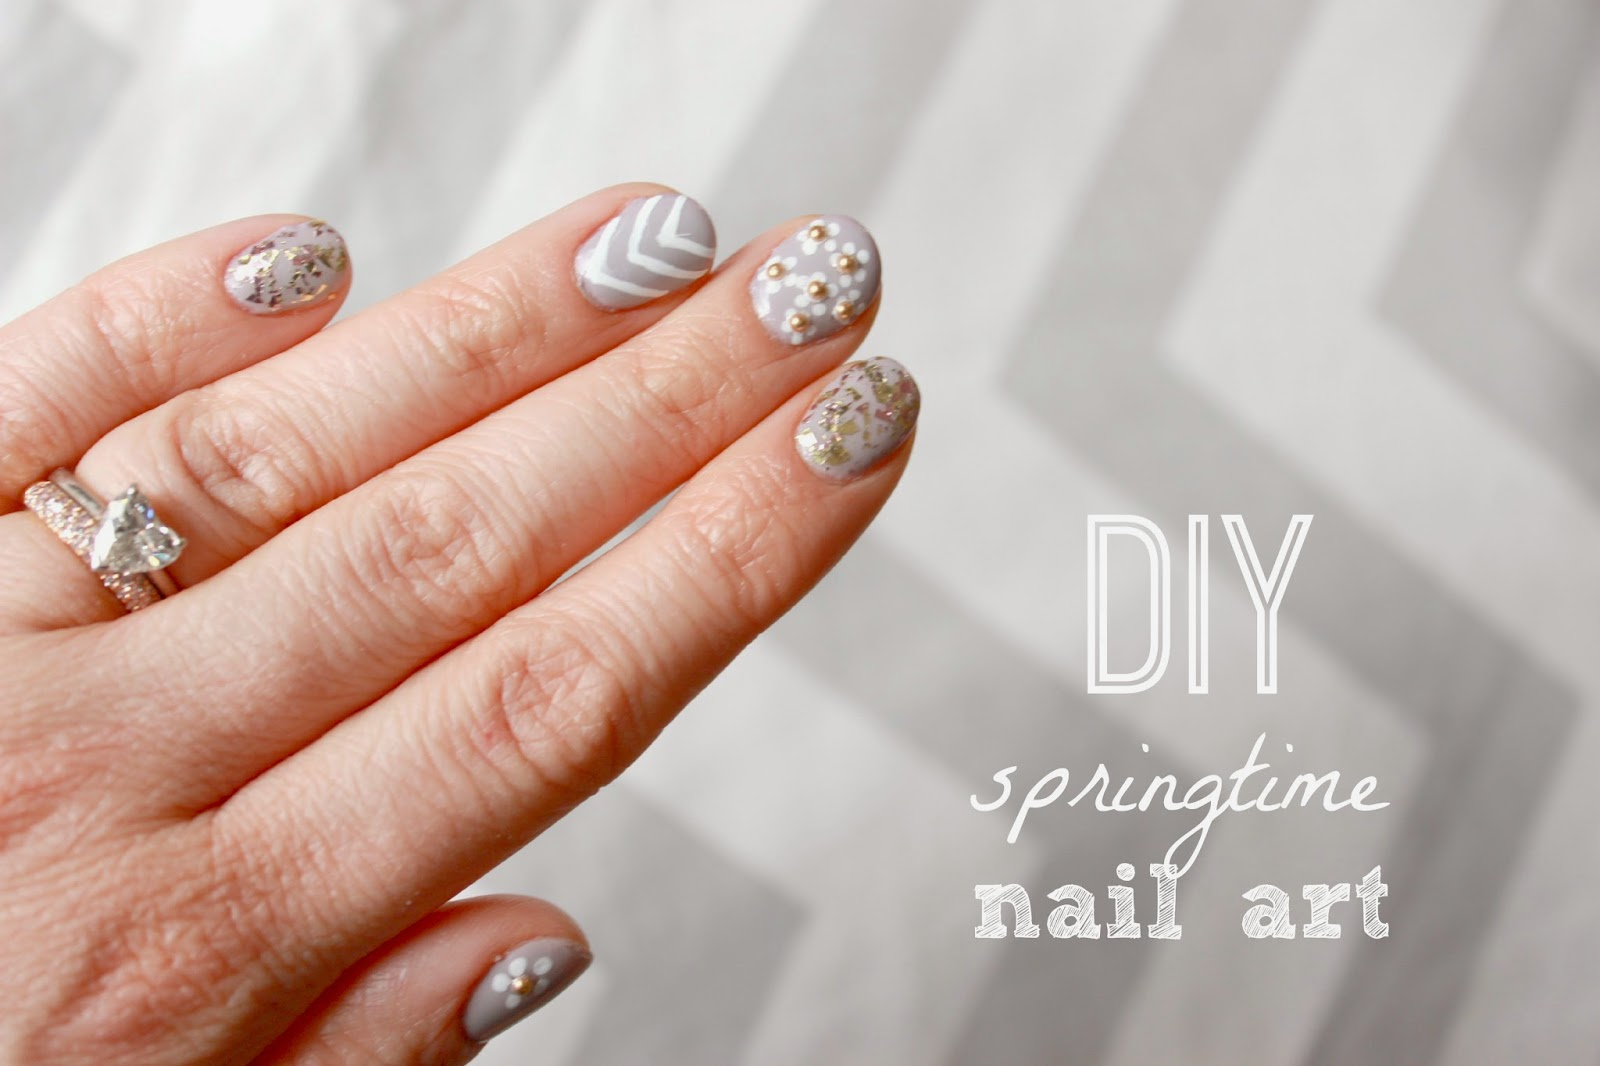 Nails of the weekdiy springtime gel nail art mrs jones london prinsesfo Images